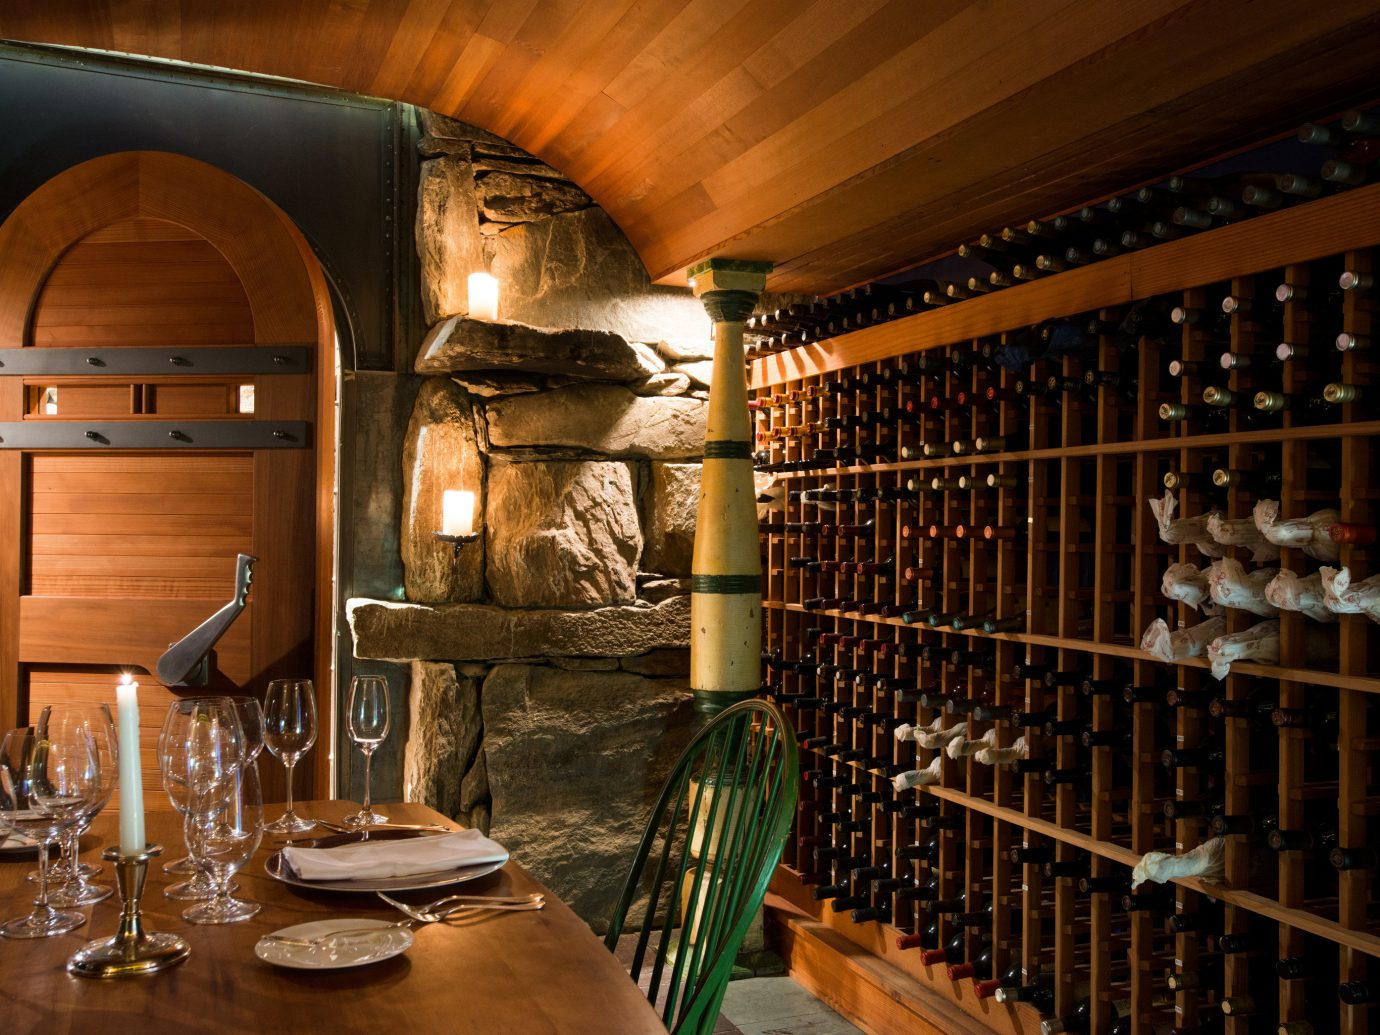 Hotels Romance indoor man made object ceiling room Winery interior design wine cellar Bar restaurant estate basement